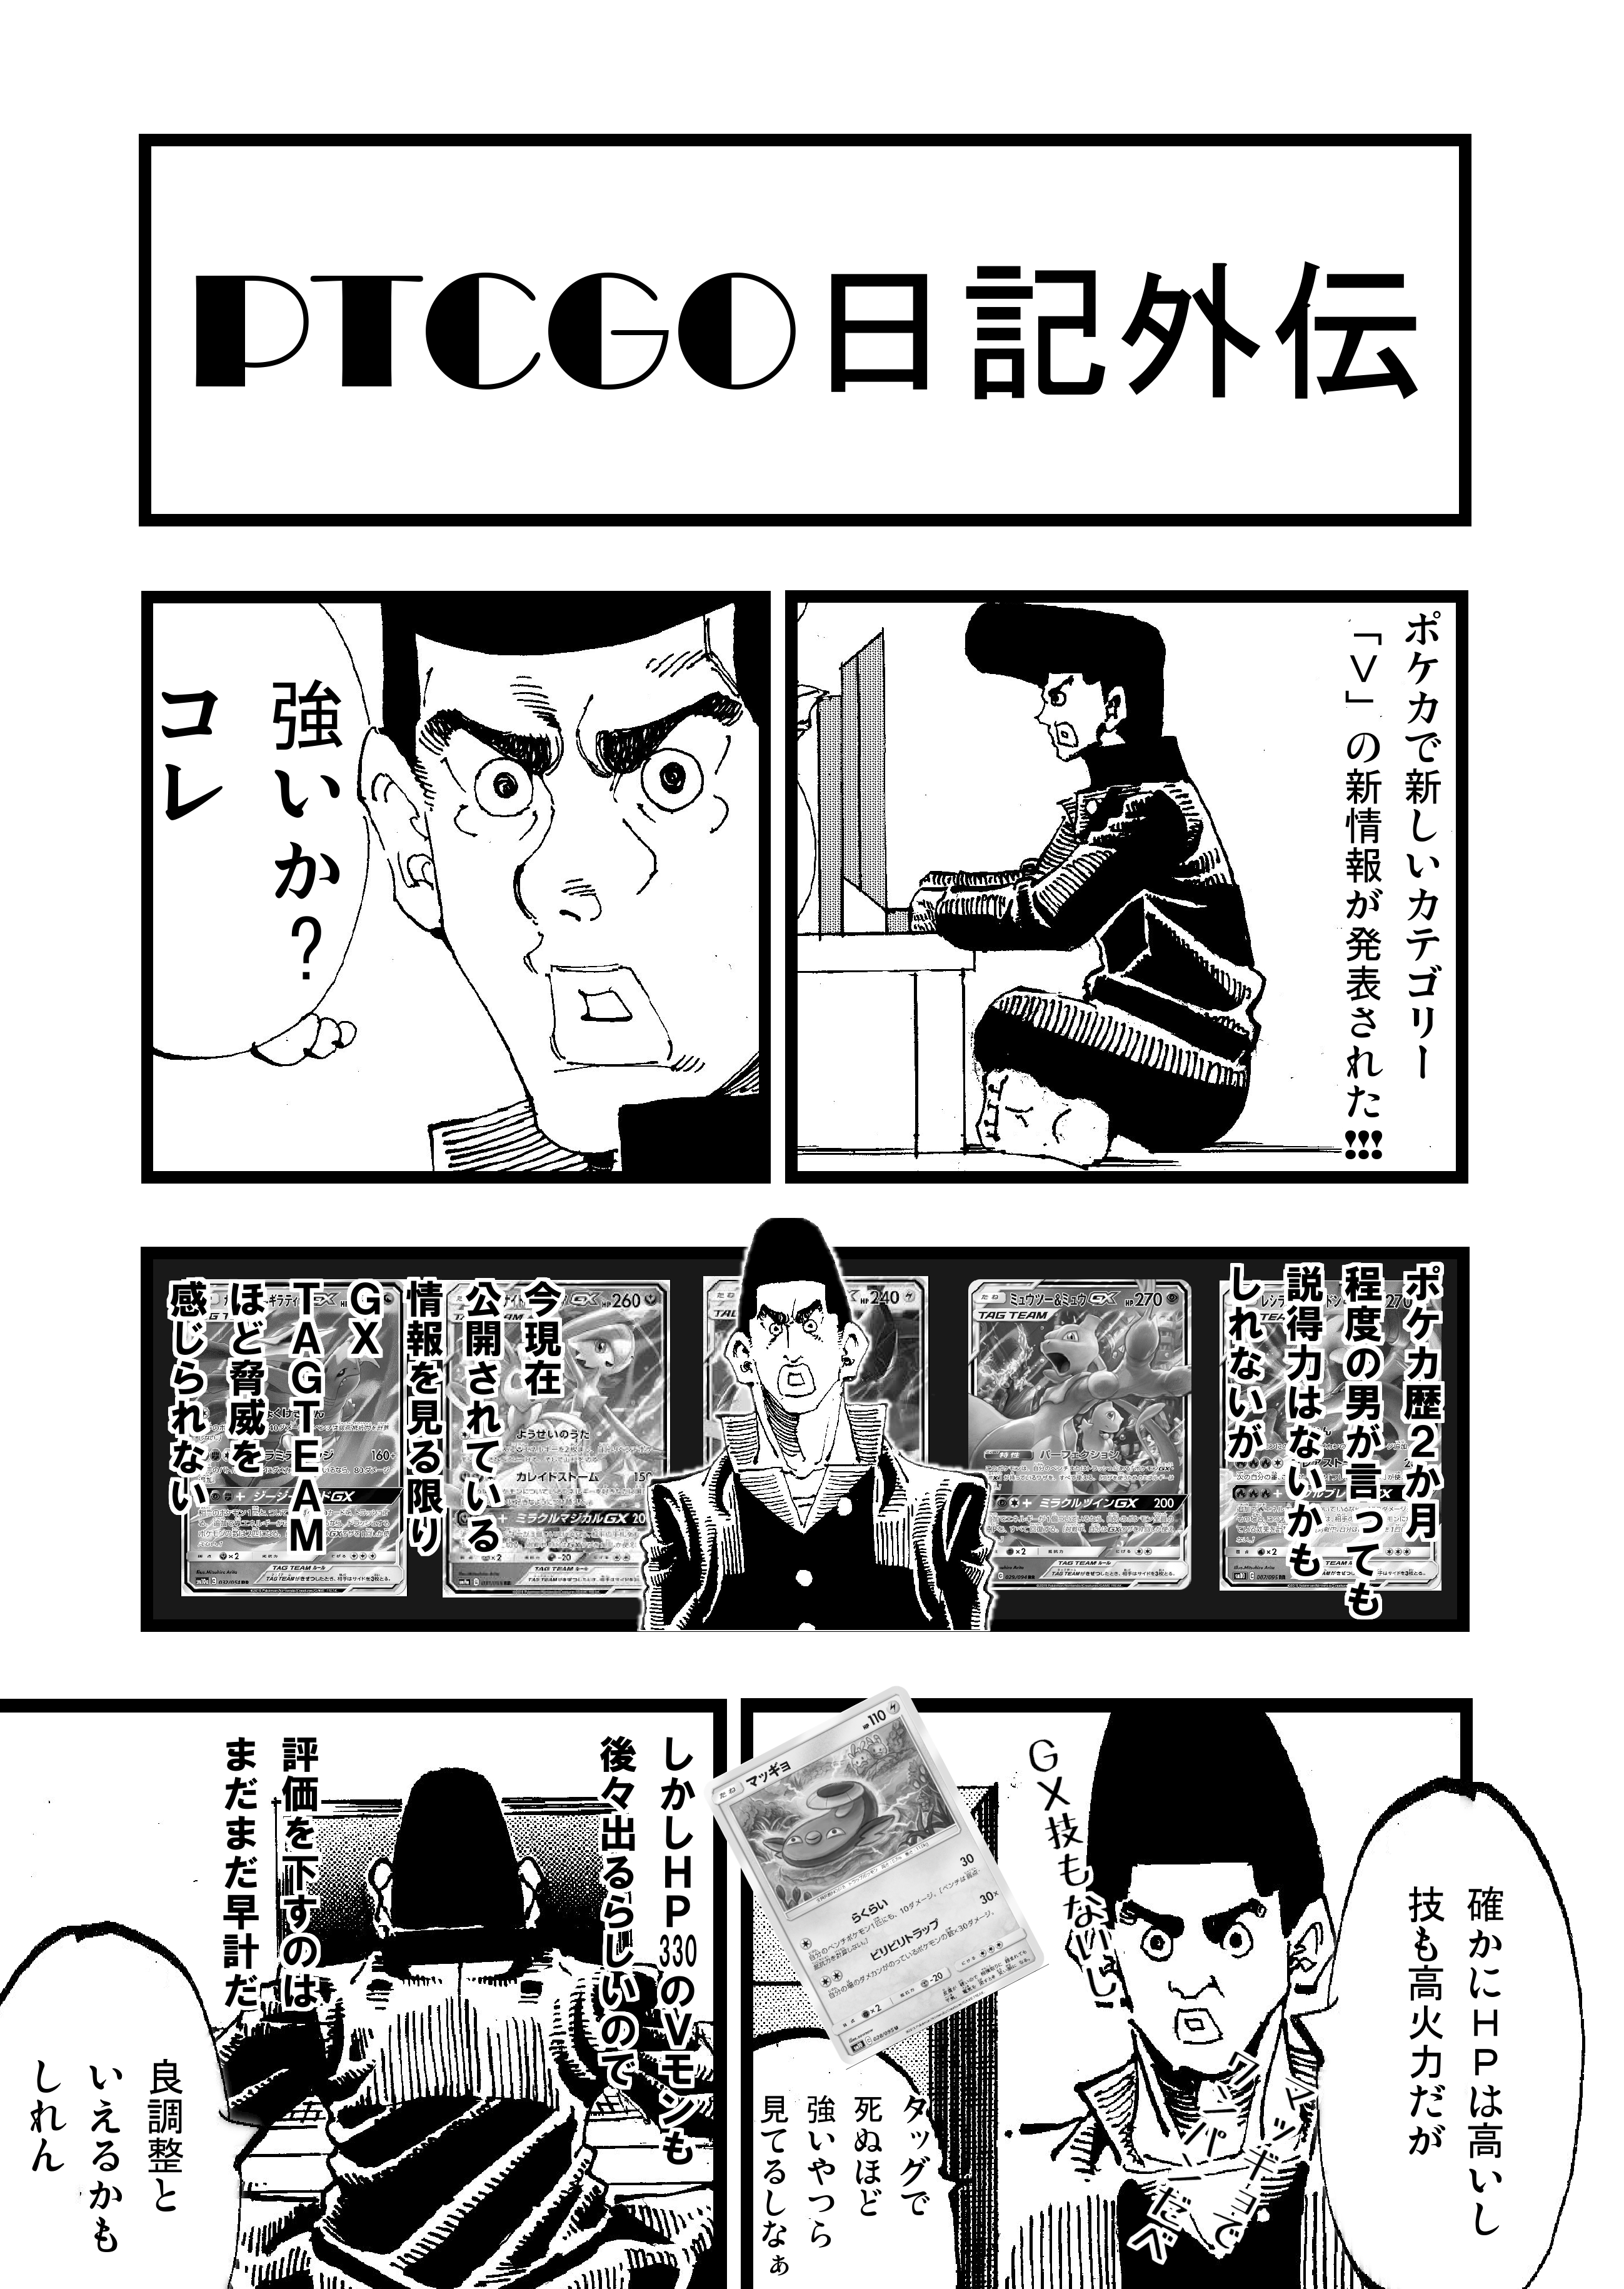 PTCGO日記外伝5 Vやねん!